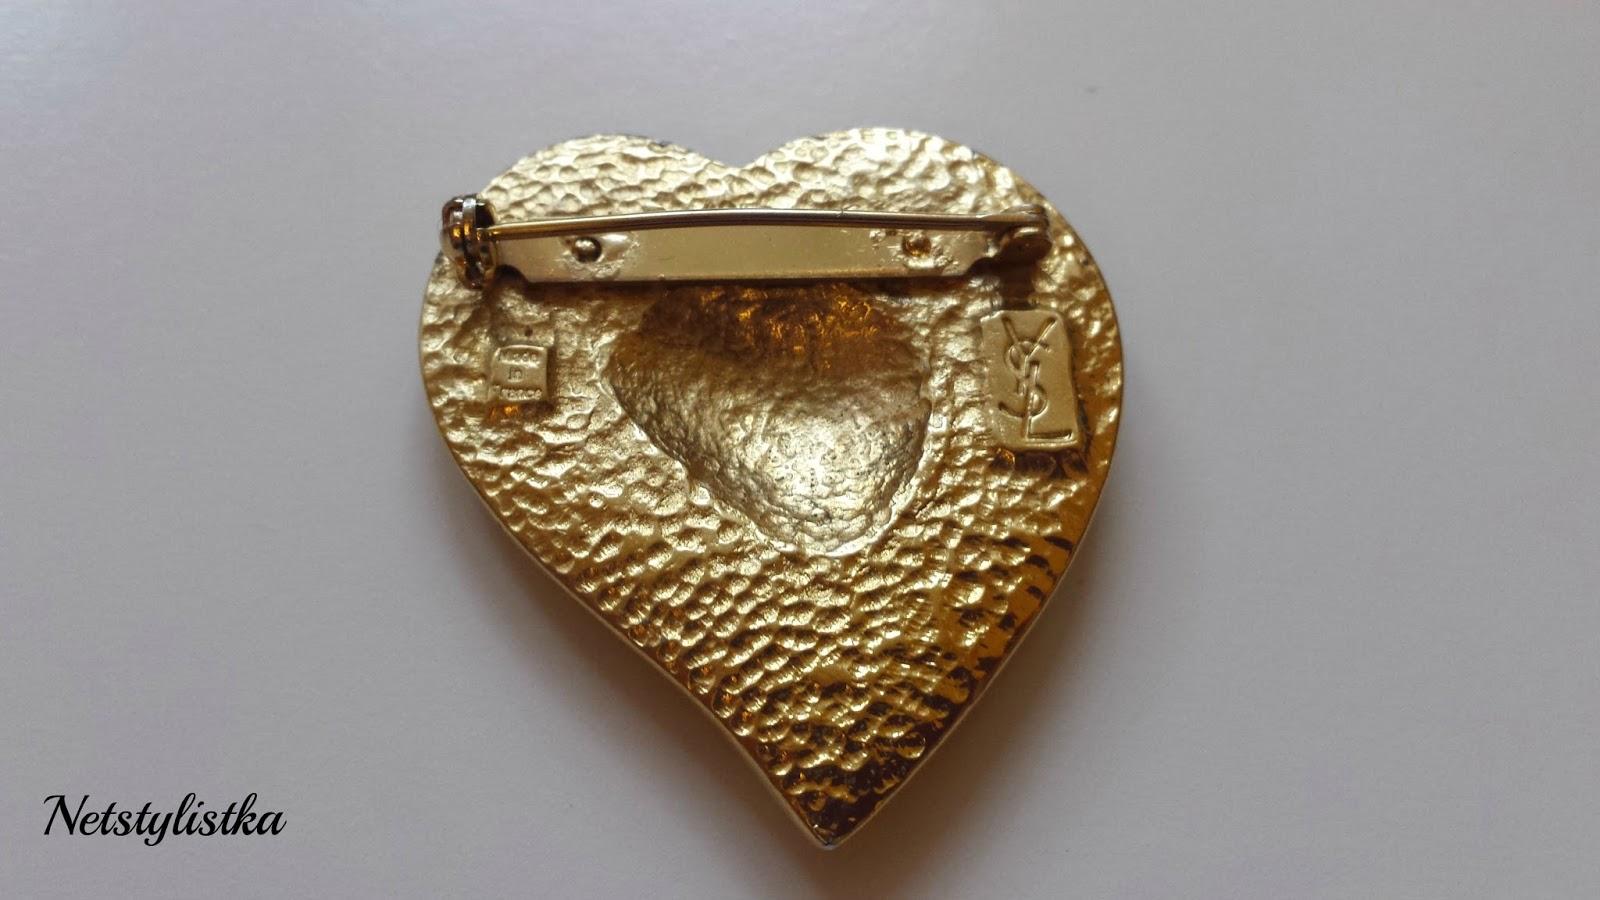 YSL vintage biżuteria broszka stara biżuteria od Yves Saint Laurent, złota broszka, blog modowy